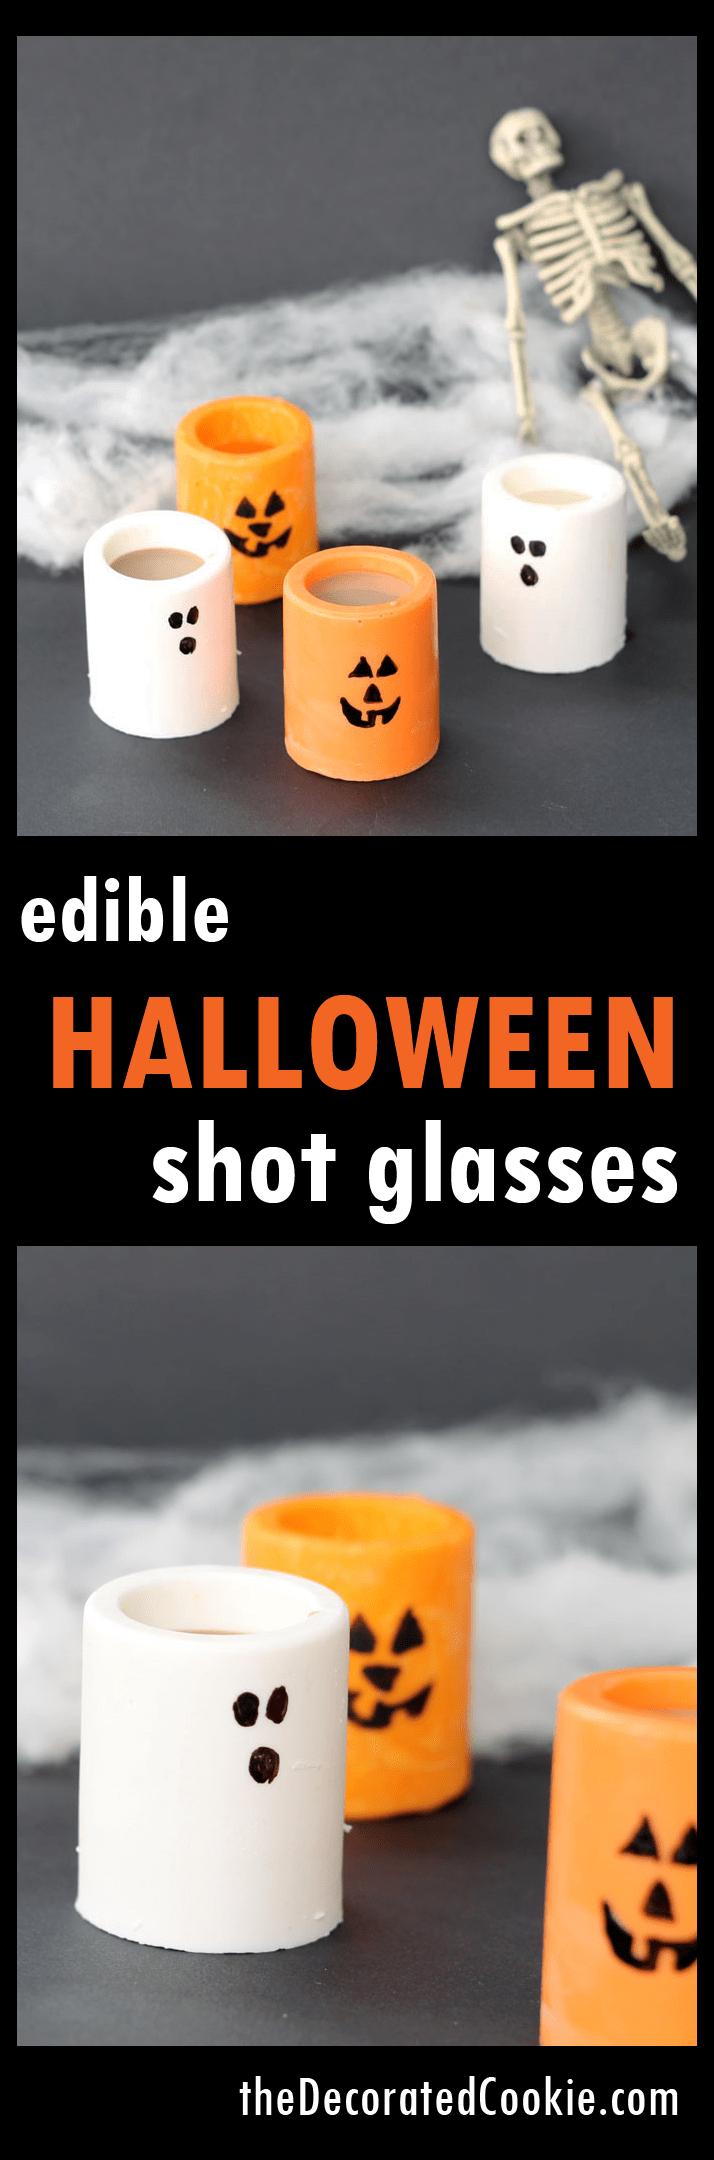 edible Halloween shot glasses